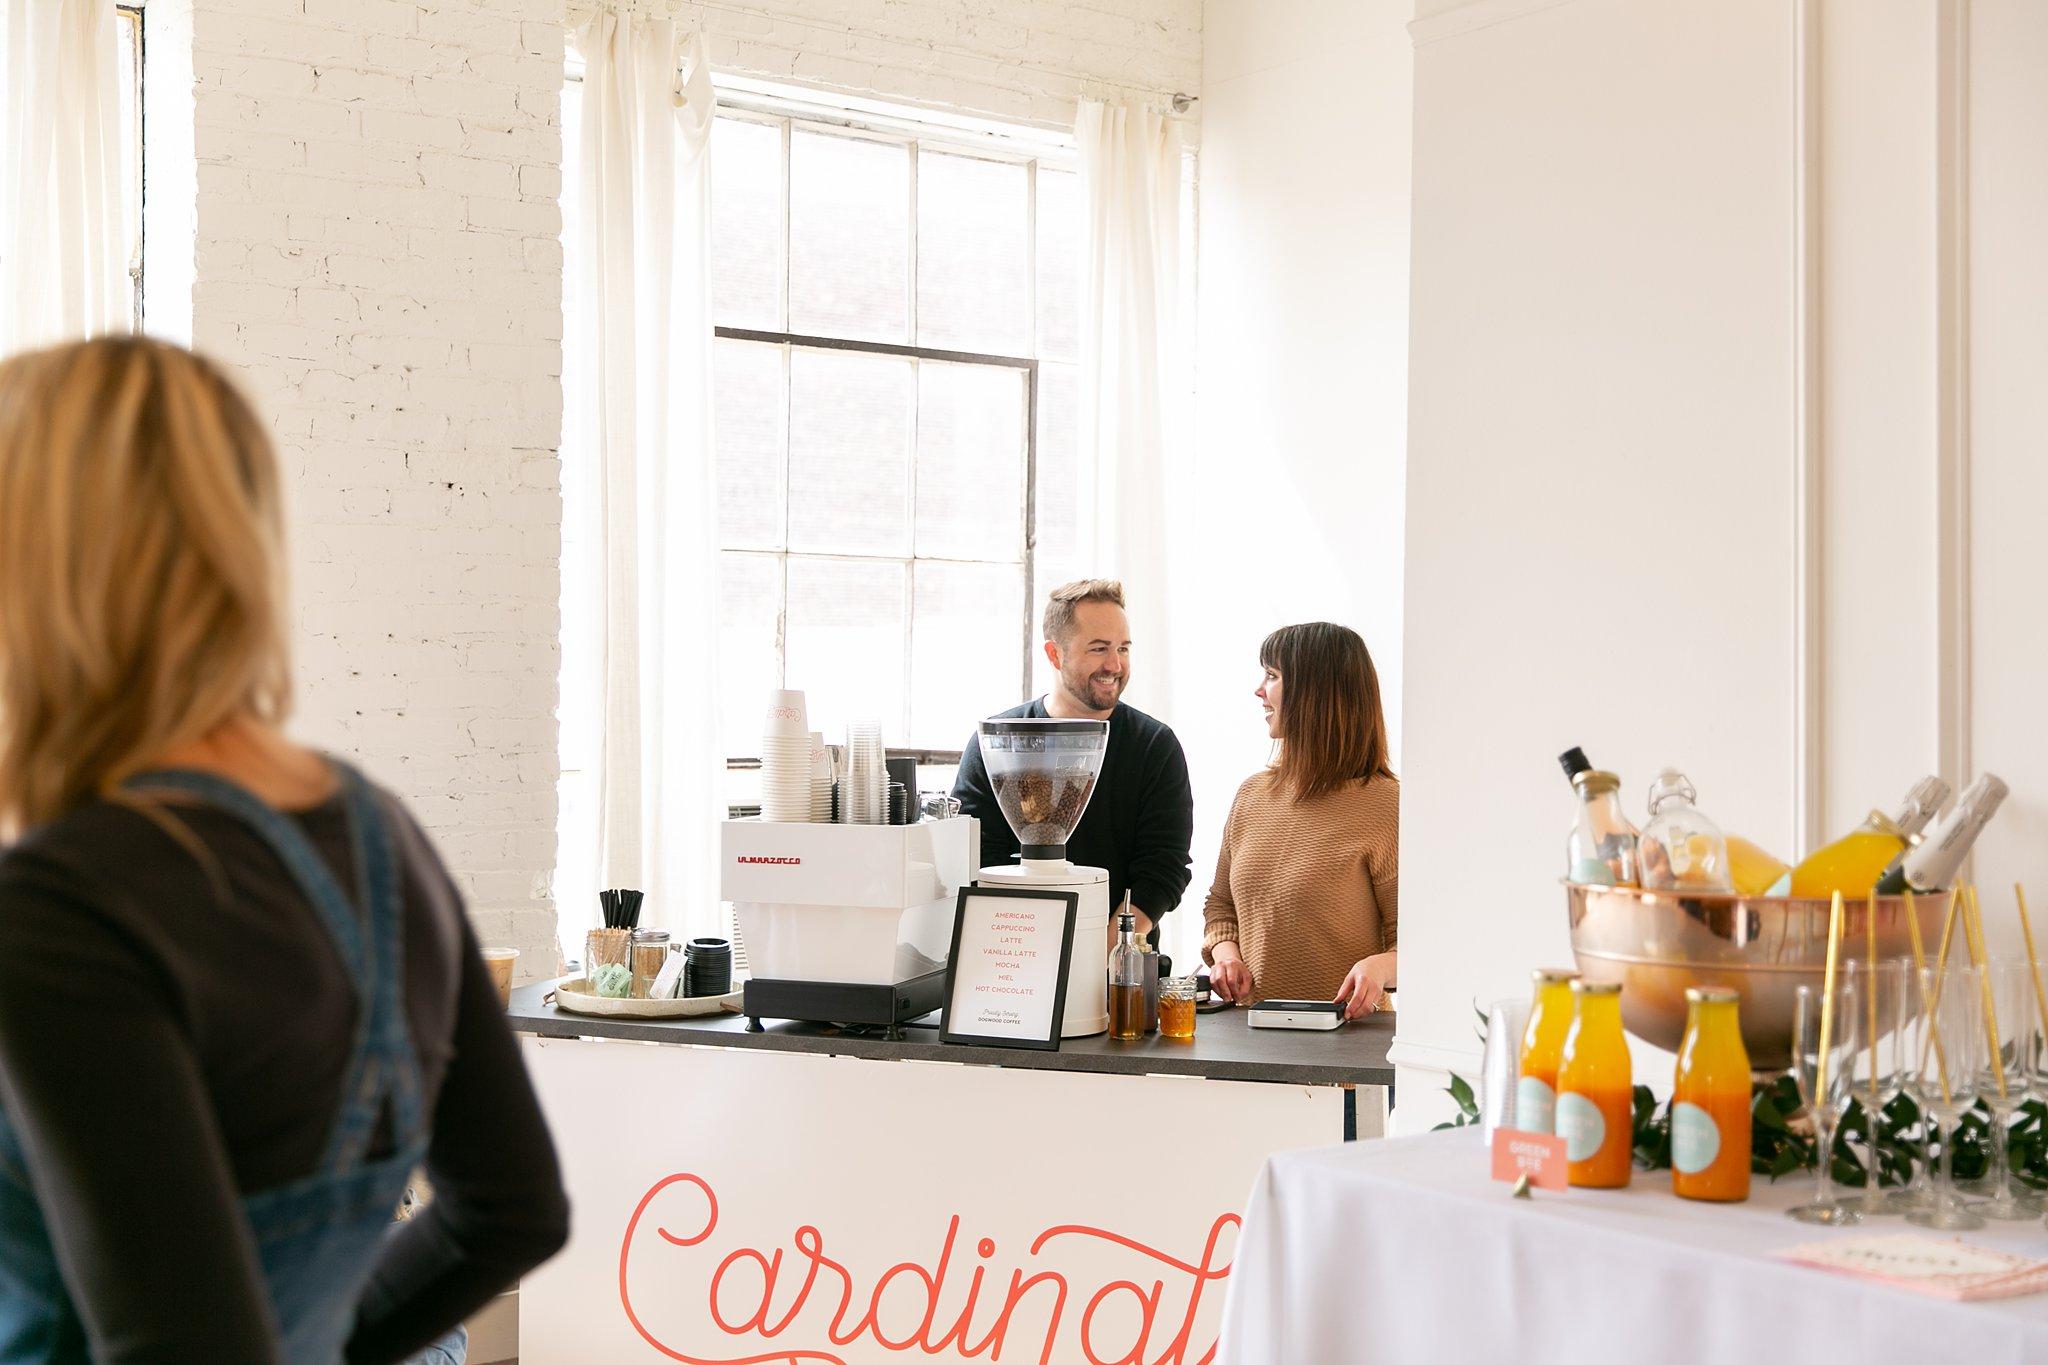 Minneapolis_cardinal_coffee_cart